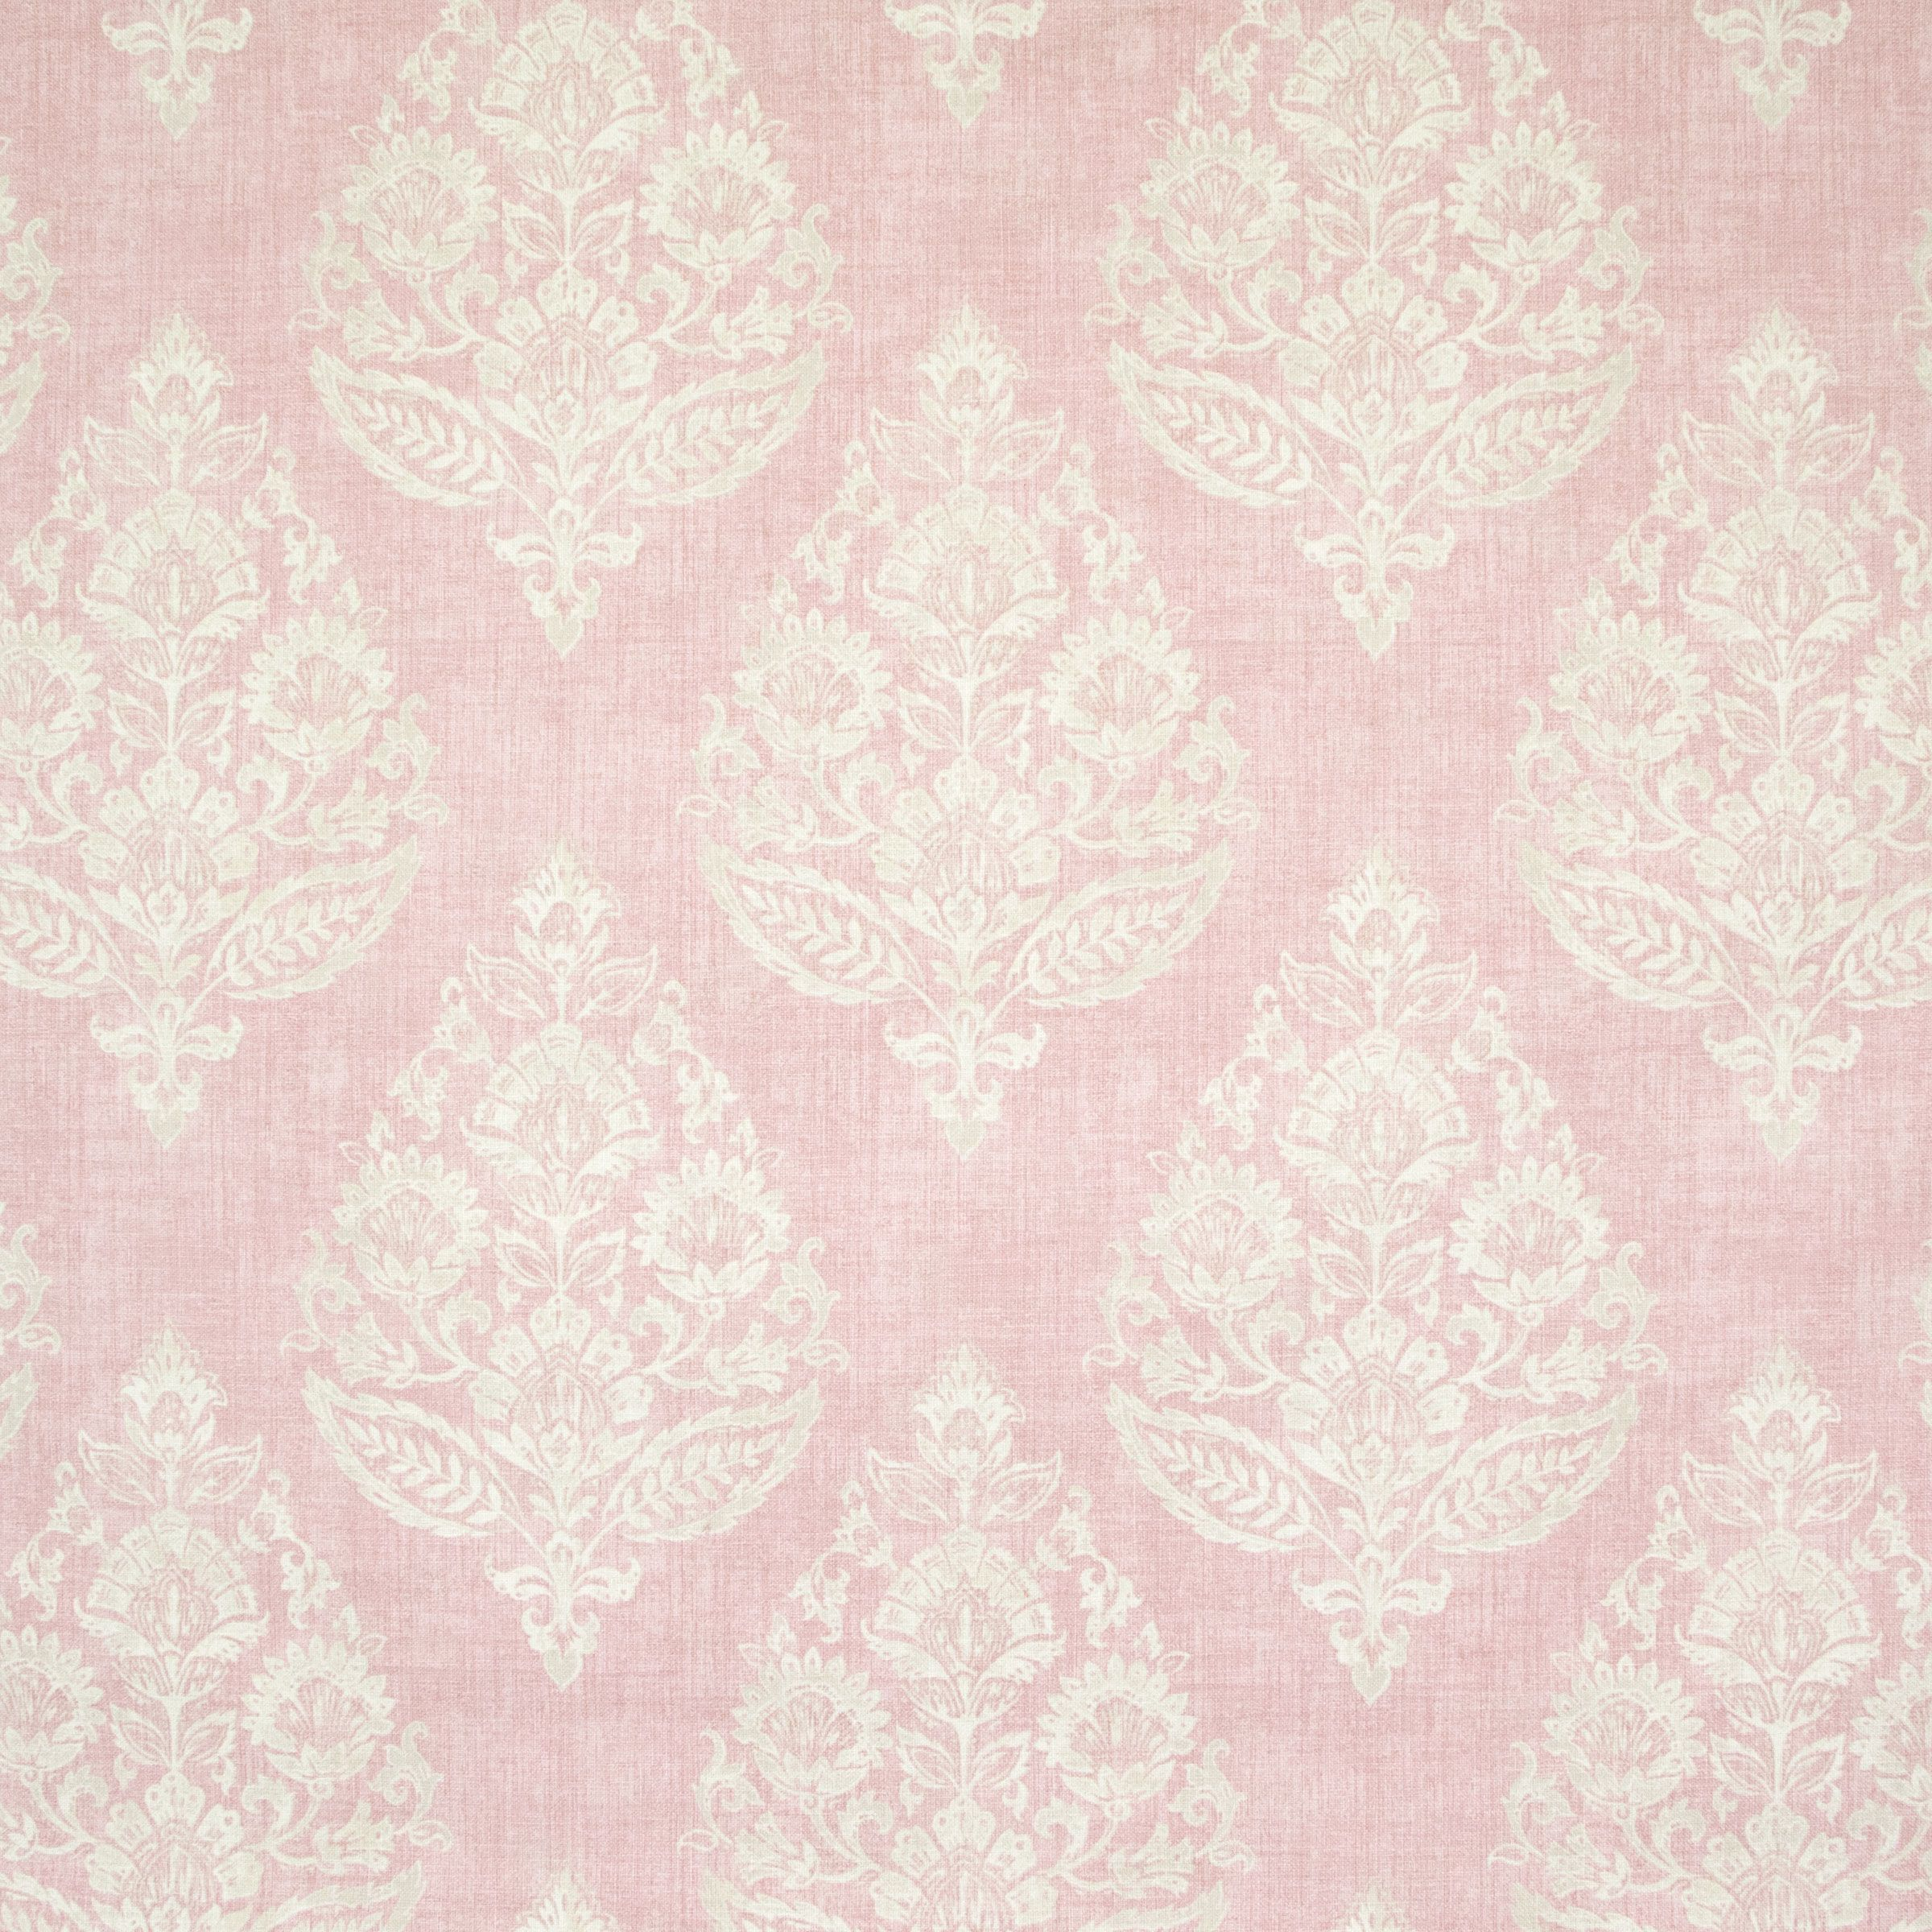 B9594 Dusty Rose Greenhouse fabrics, Floral fabric, Pink